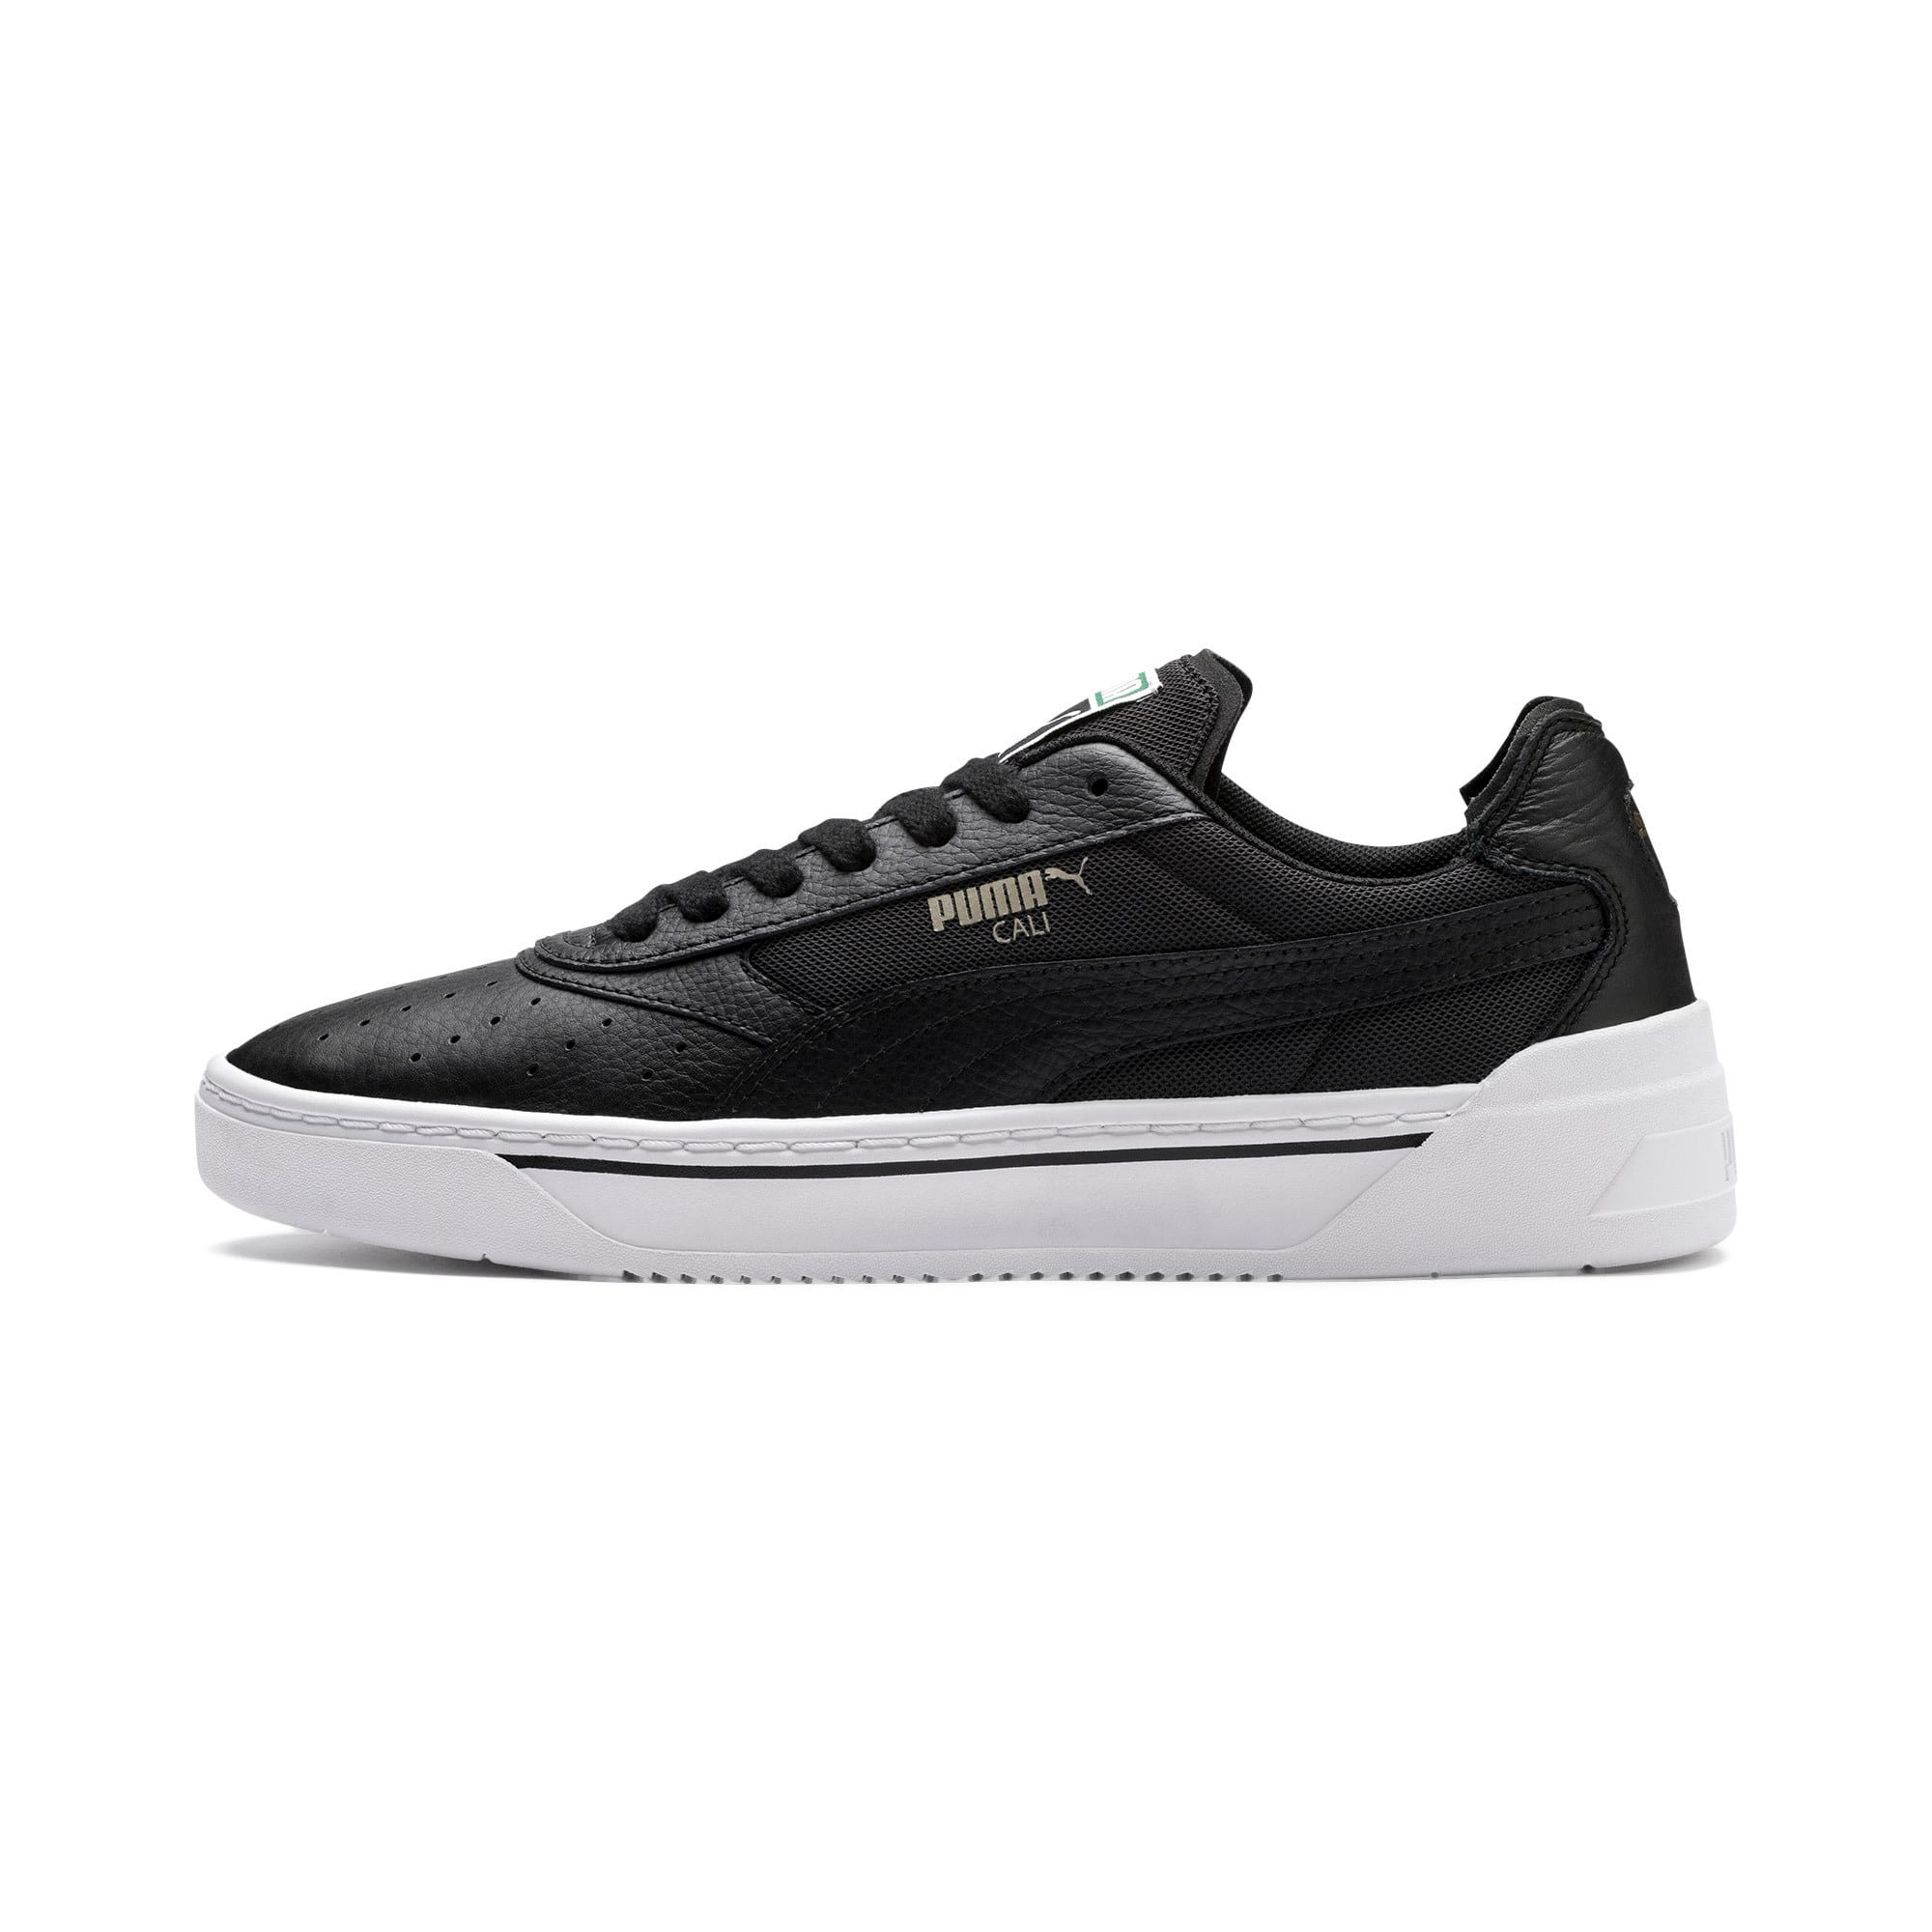 Thumbnail 1 of Cali-0 Sneakers, Puma Black-Puma Blk-Puma Wht, medium